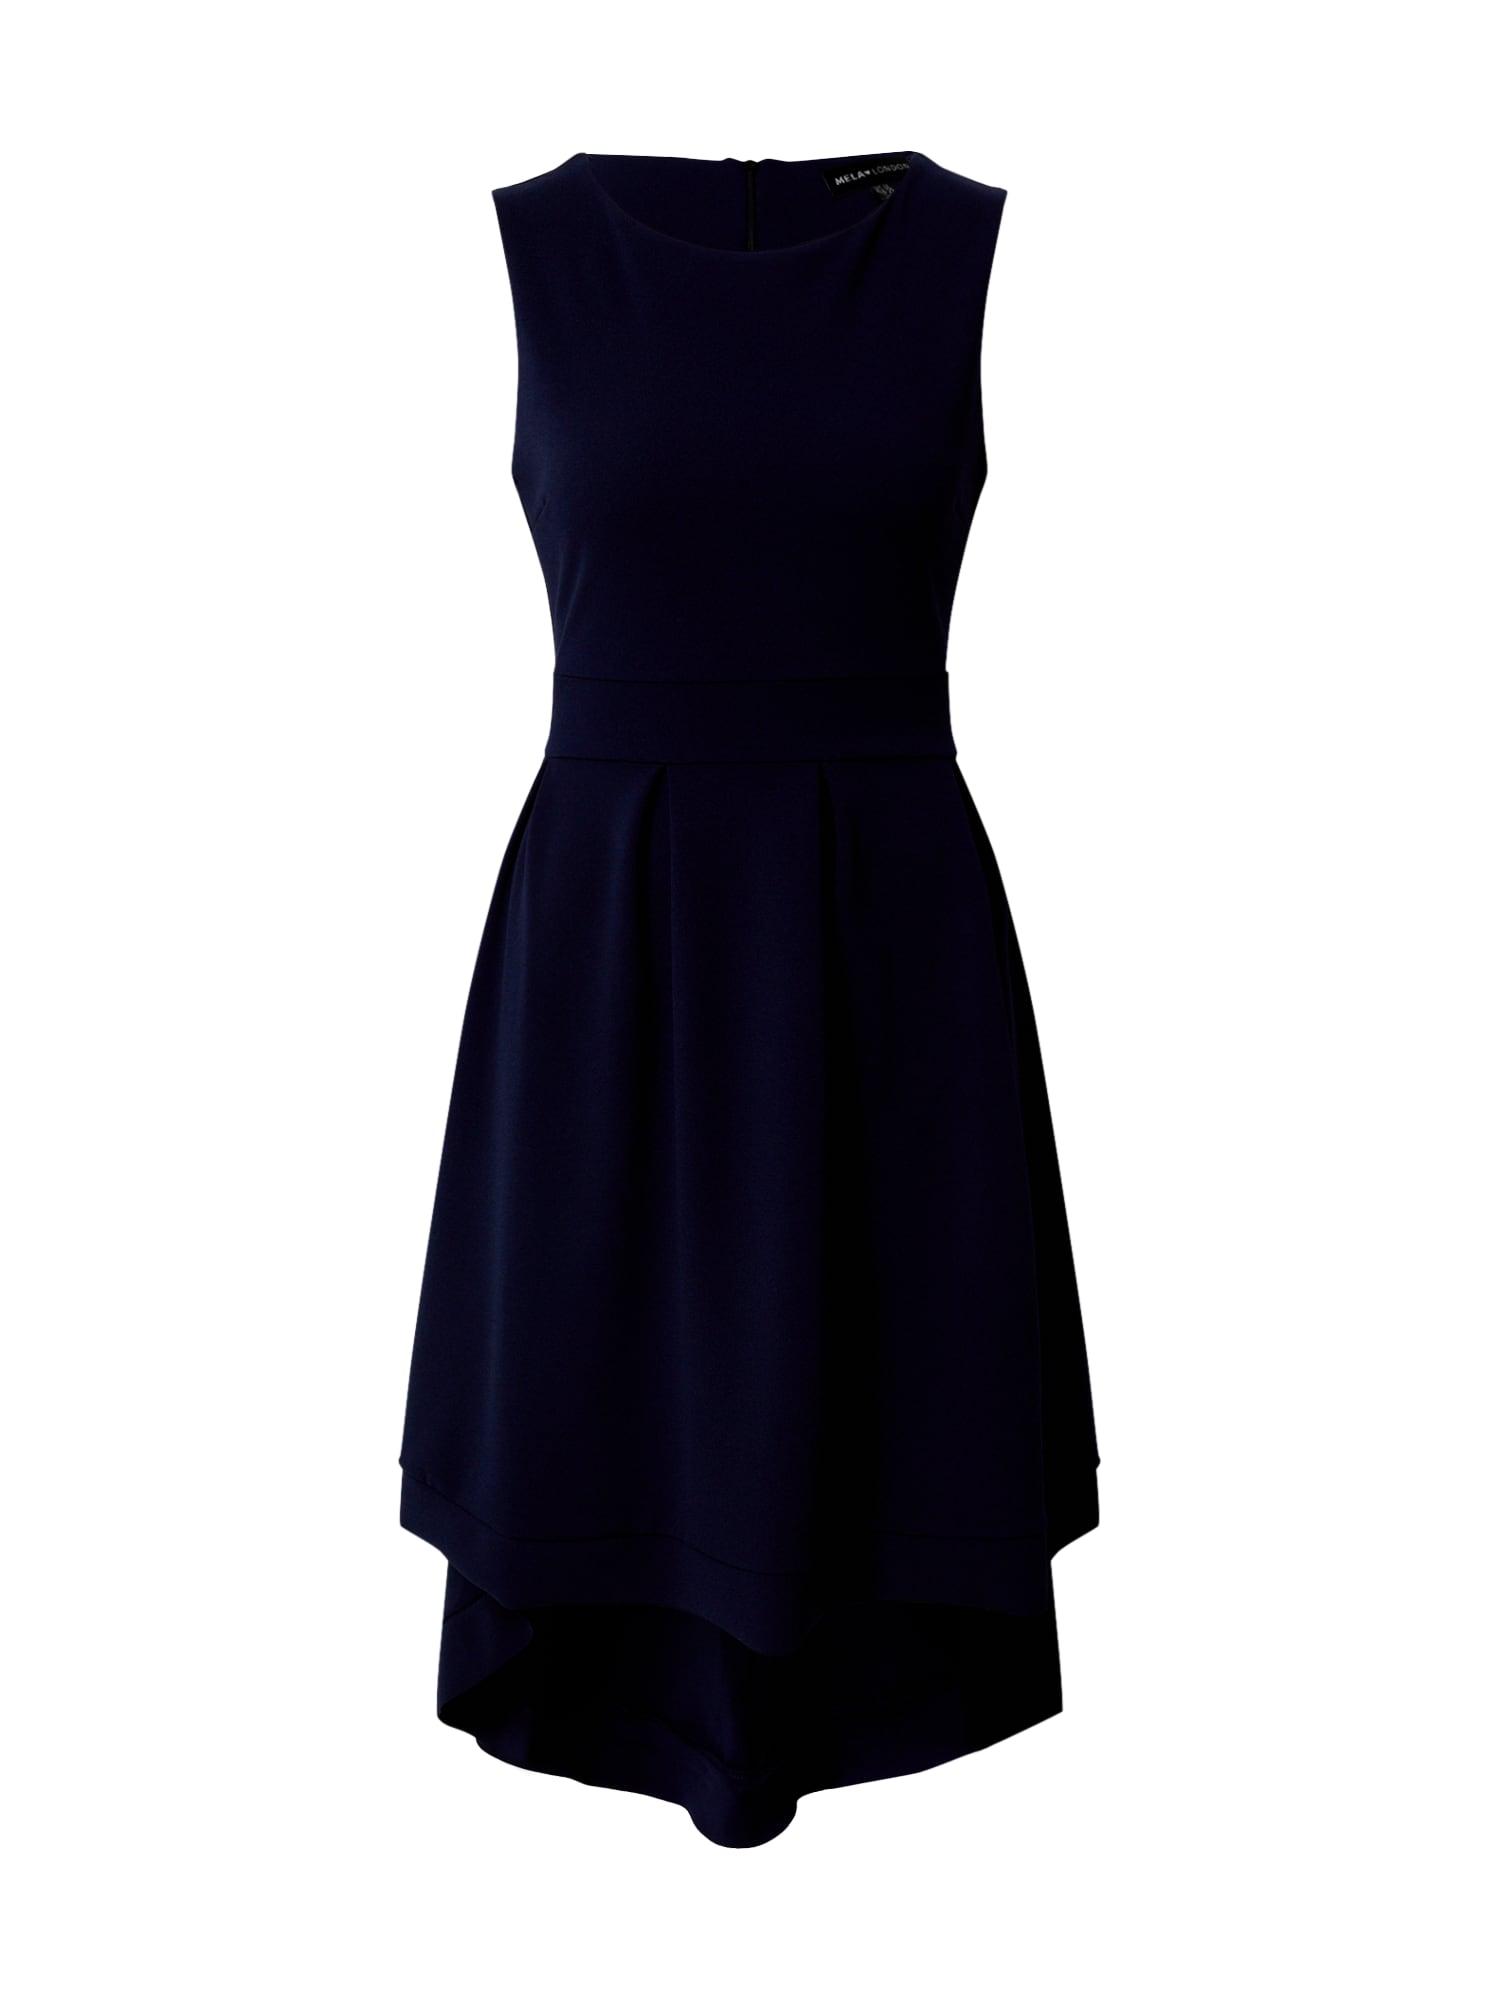 Mela London Suknelė tamsiai mėlyna